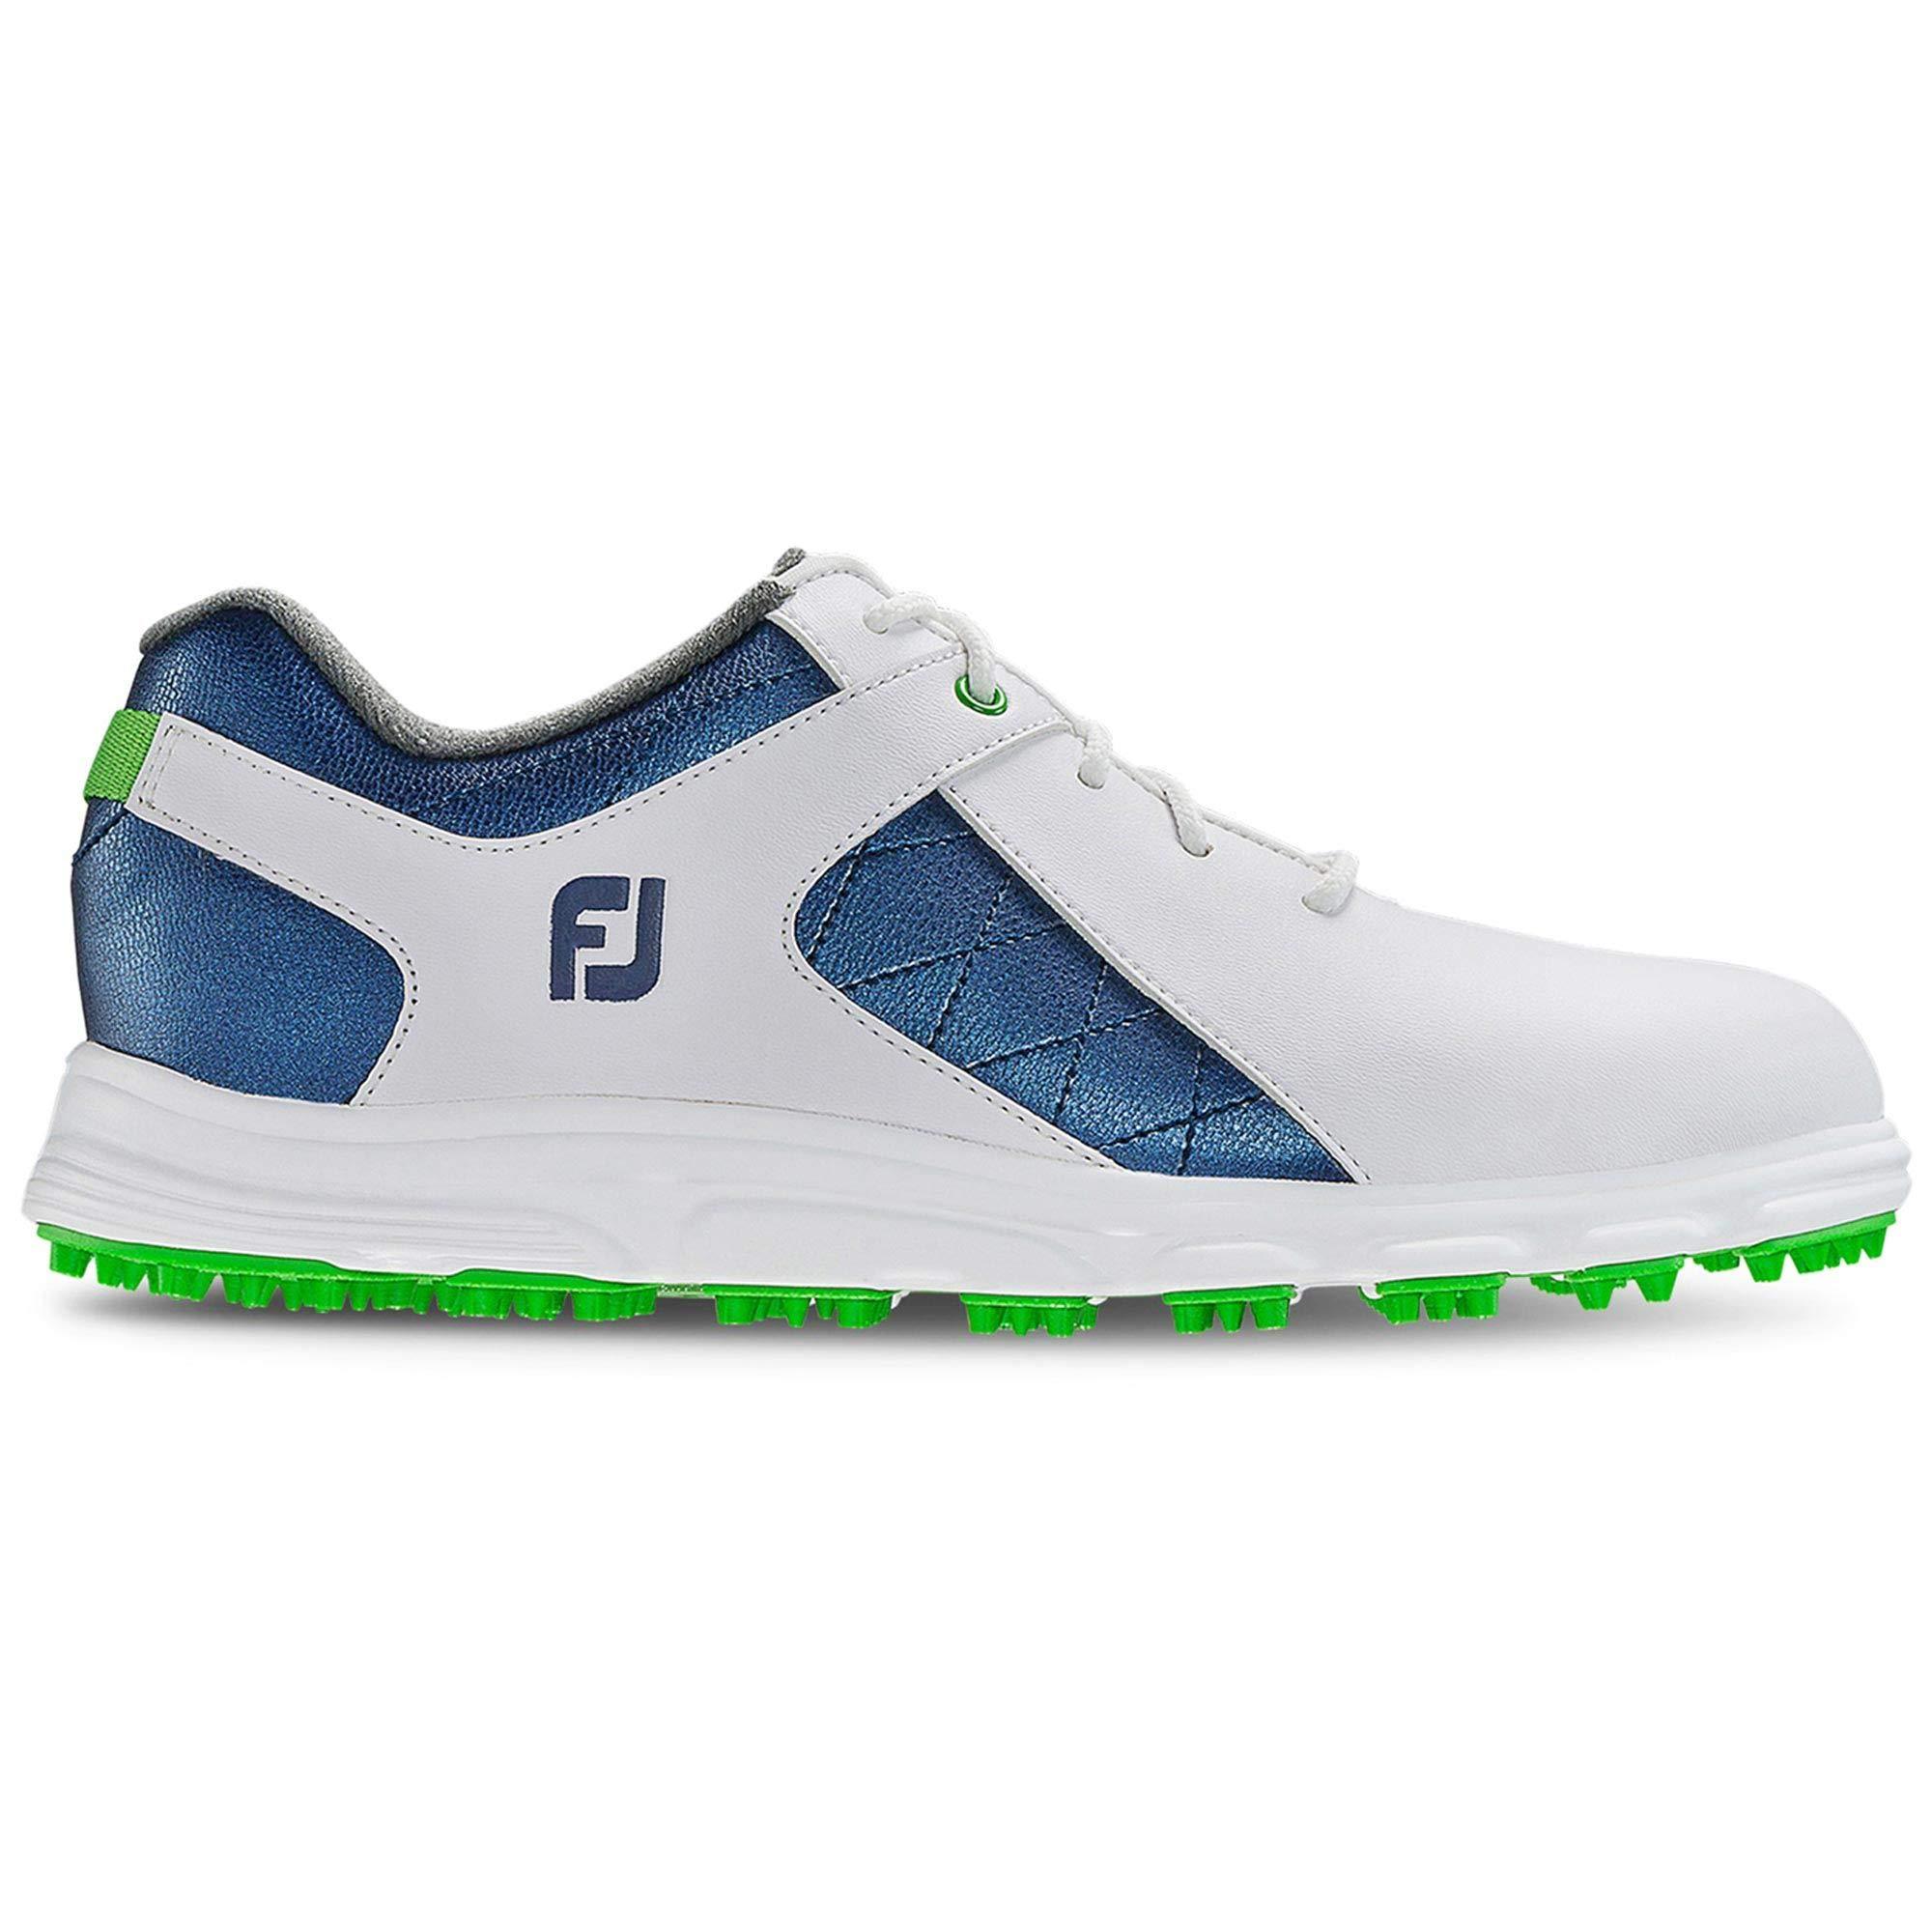 FootJoy Boys Pro/SL Junior-Previous Season Style Golf Shoes, White/Blue, 6 M US Big Kid